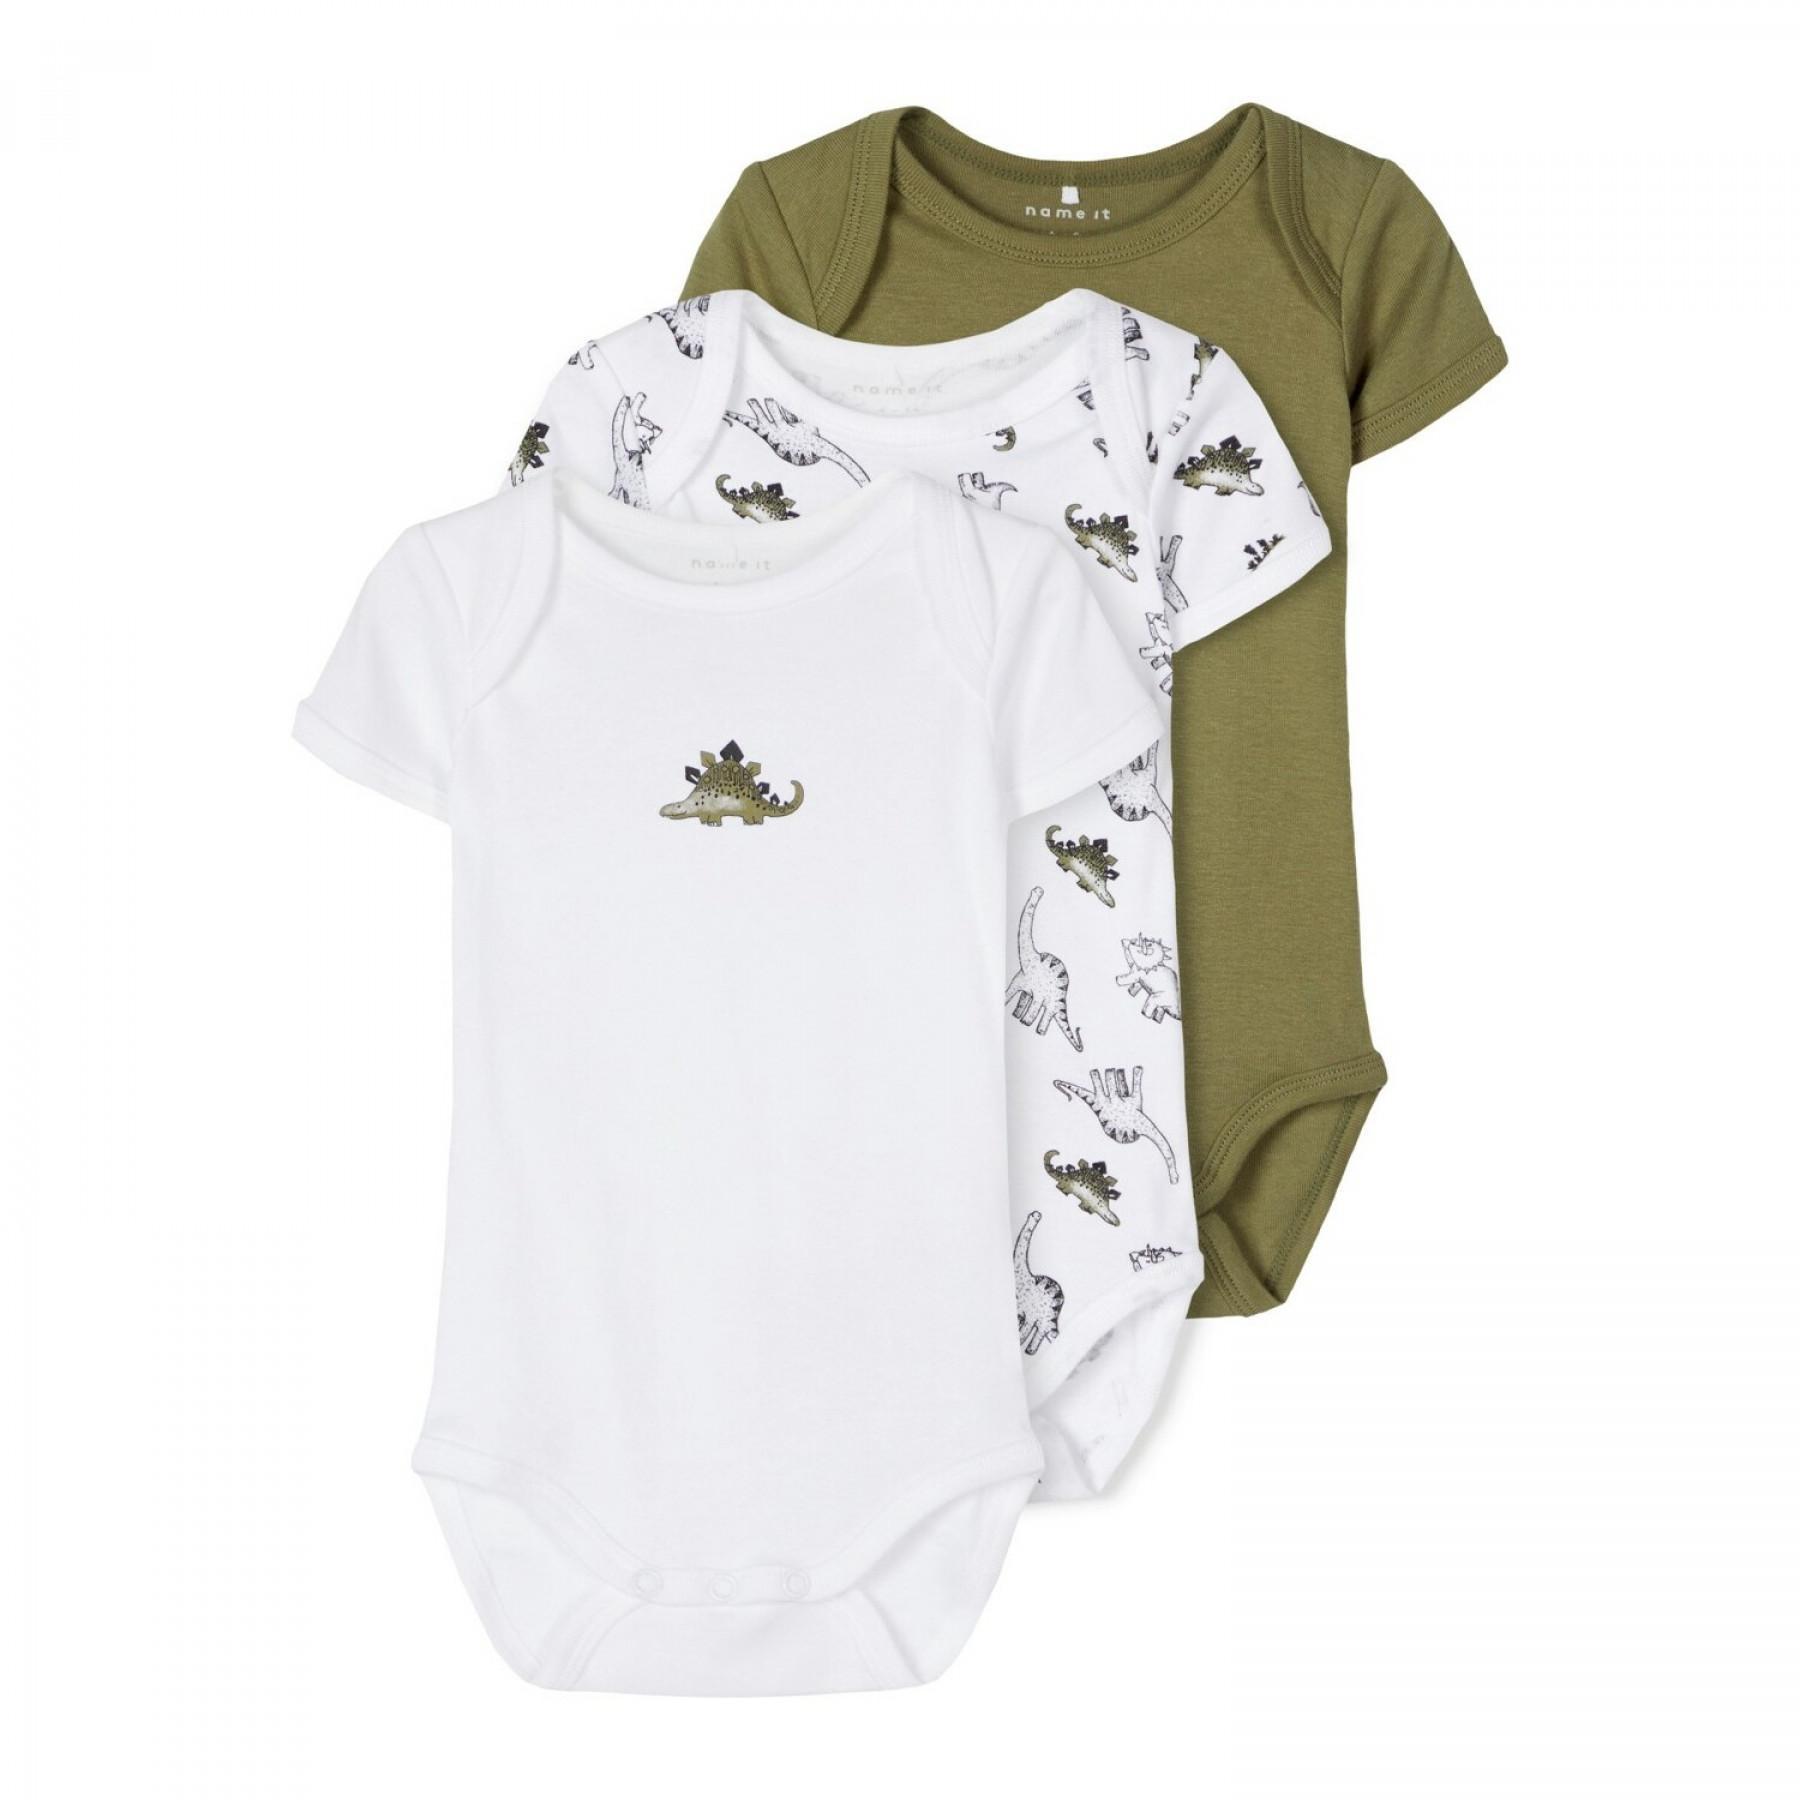 Set of 3 baby bodysuits Name it Dino